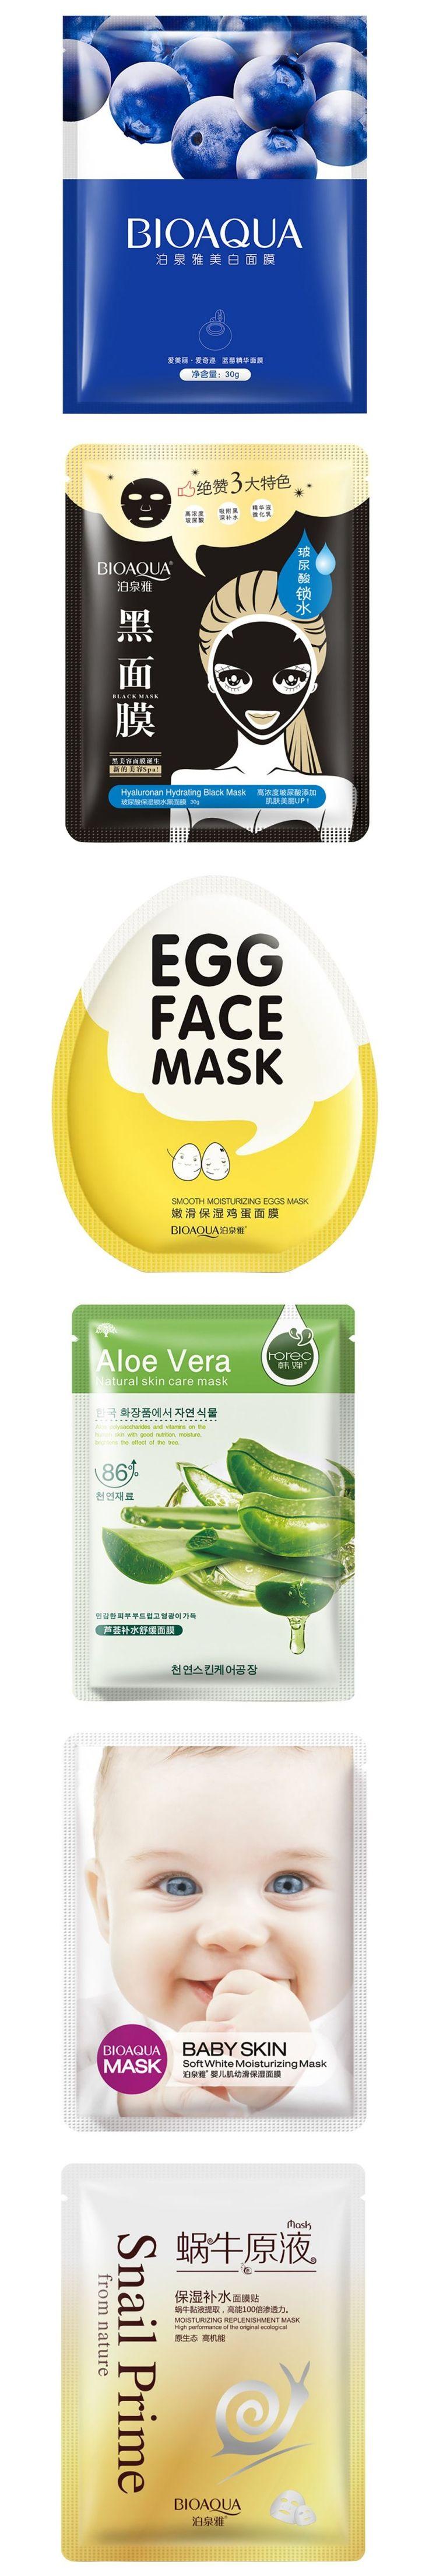 Moisturizing Face Mask Oil Control Brighten Wrapped Mask Face Care Egg Facial Masks Tender